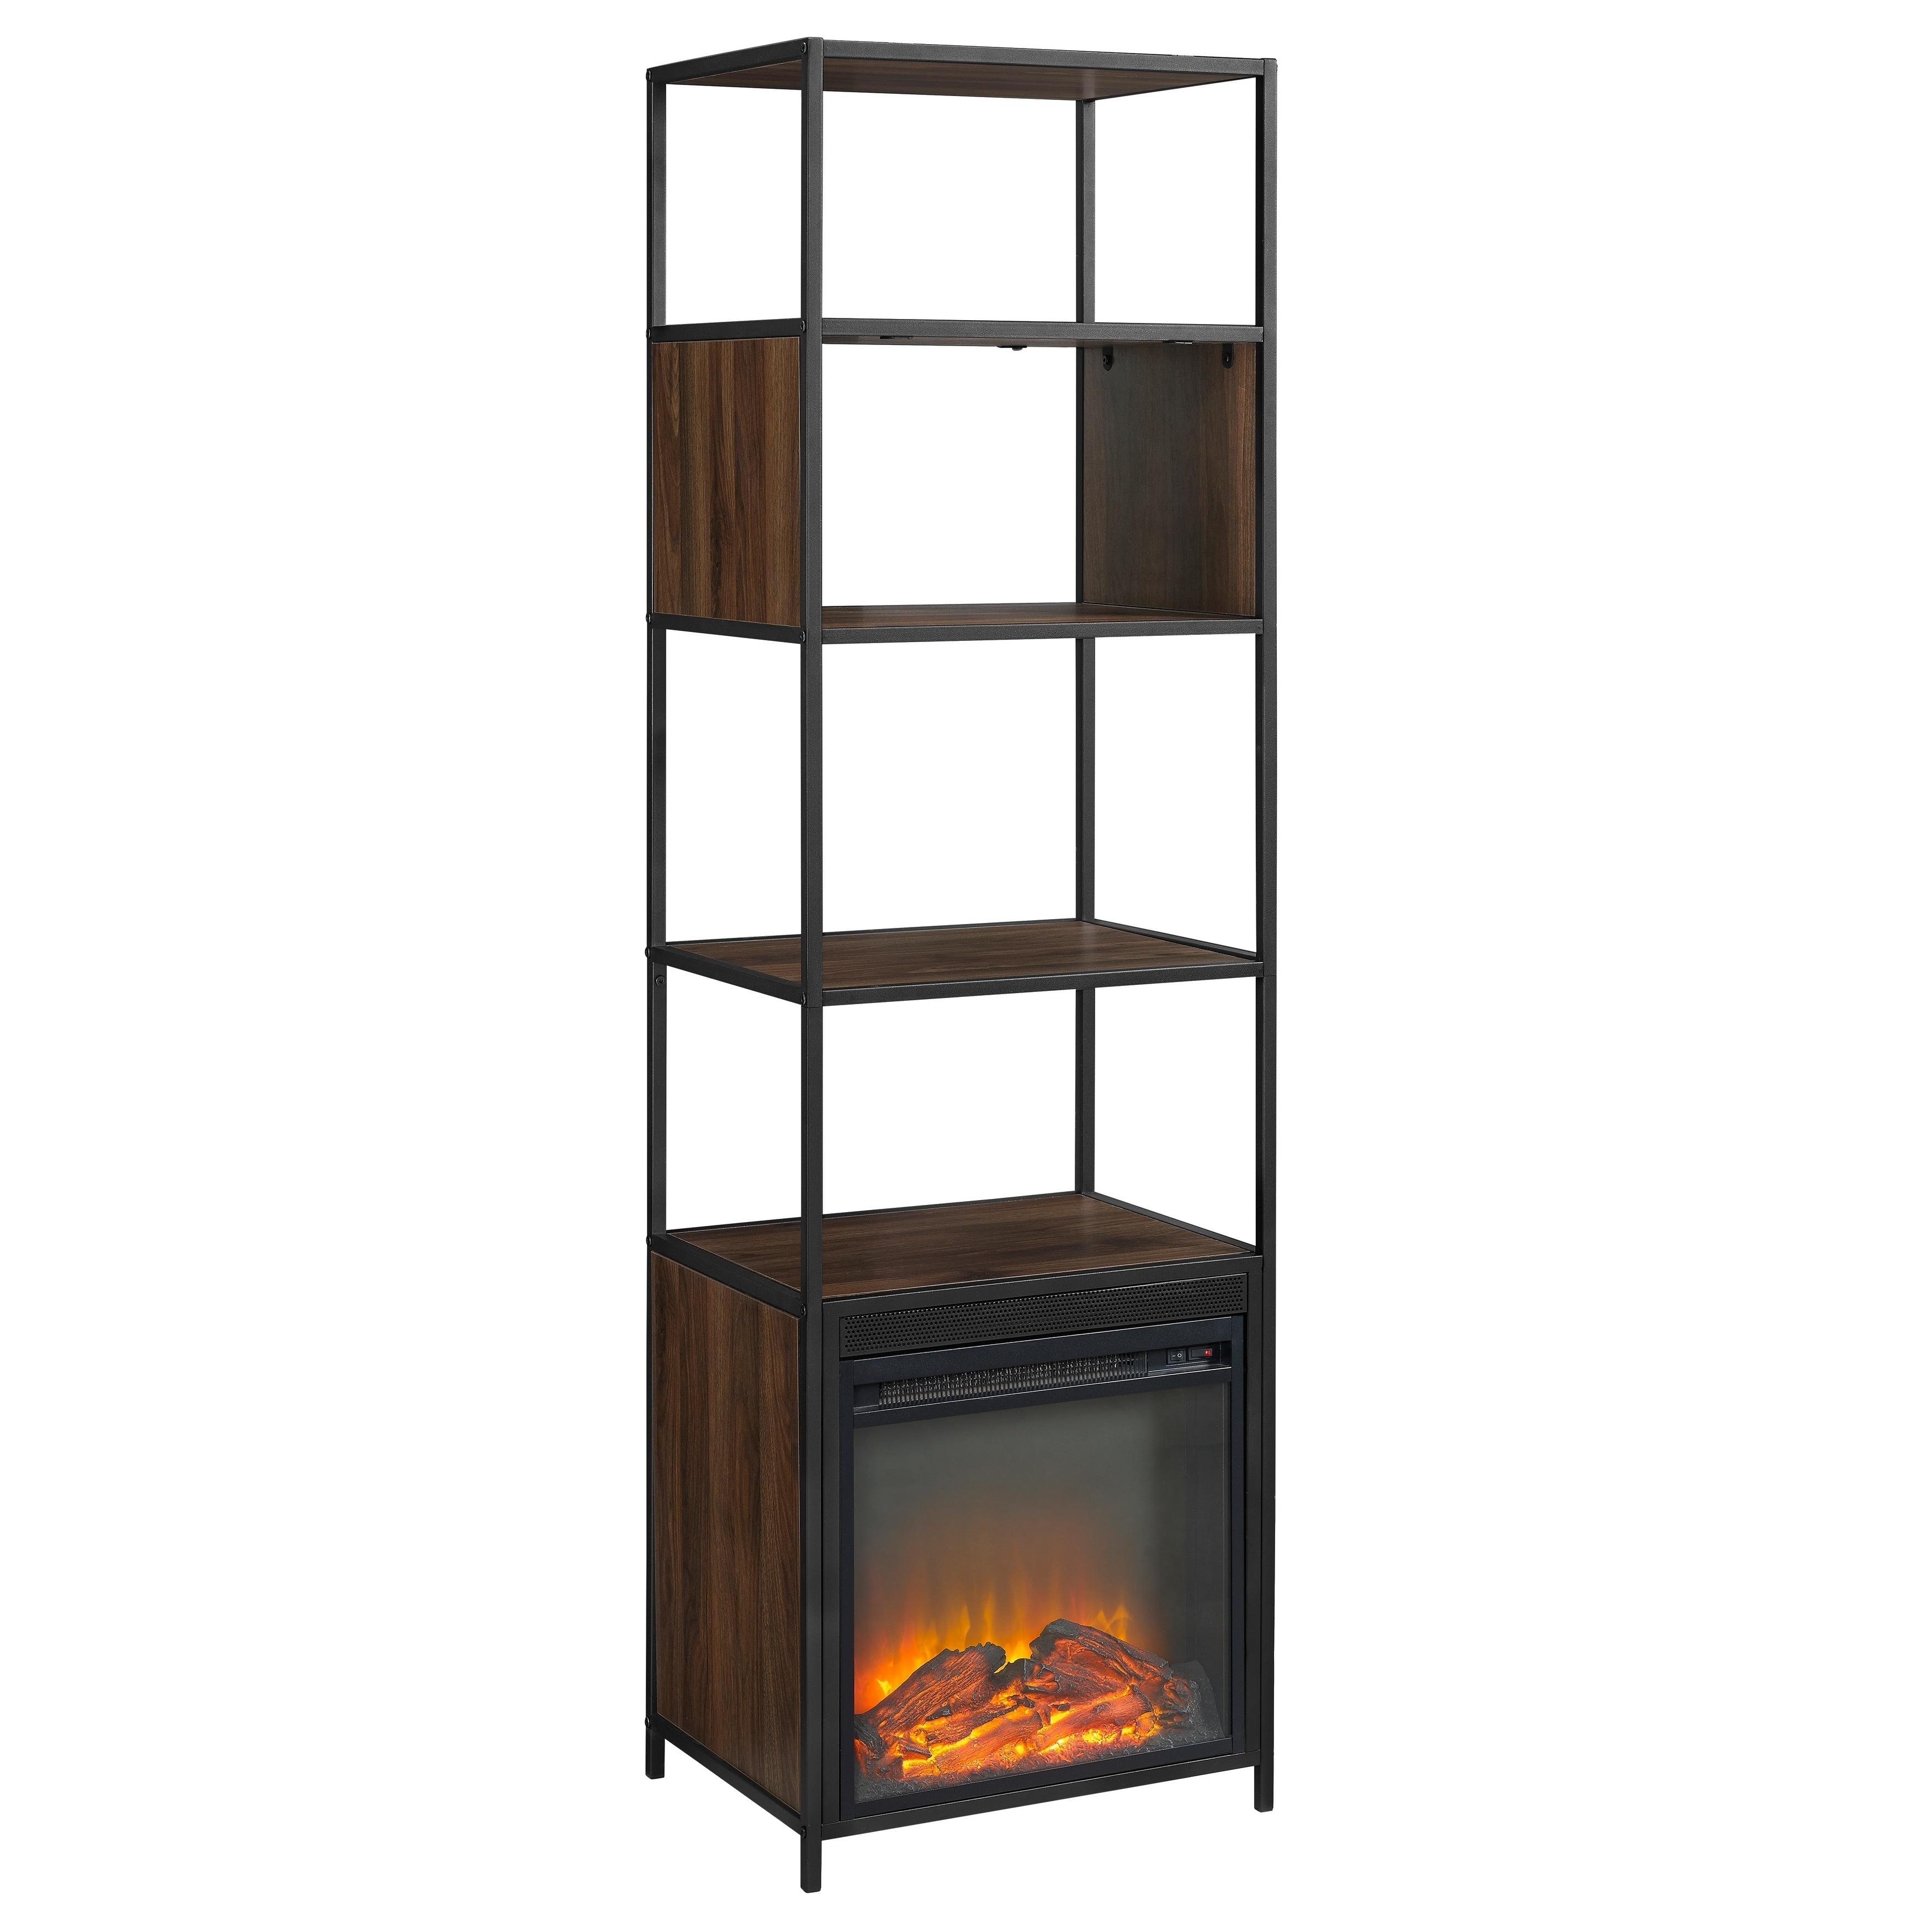 Shop Metal And Wood Tower Bookshelf Fireplace